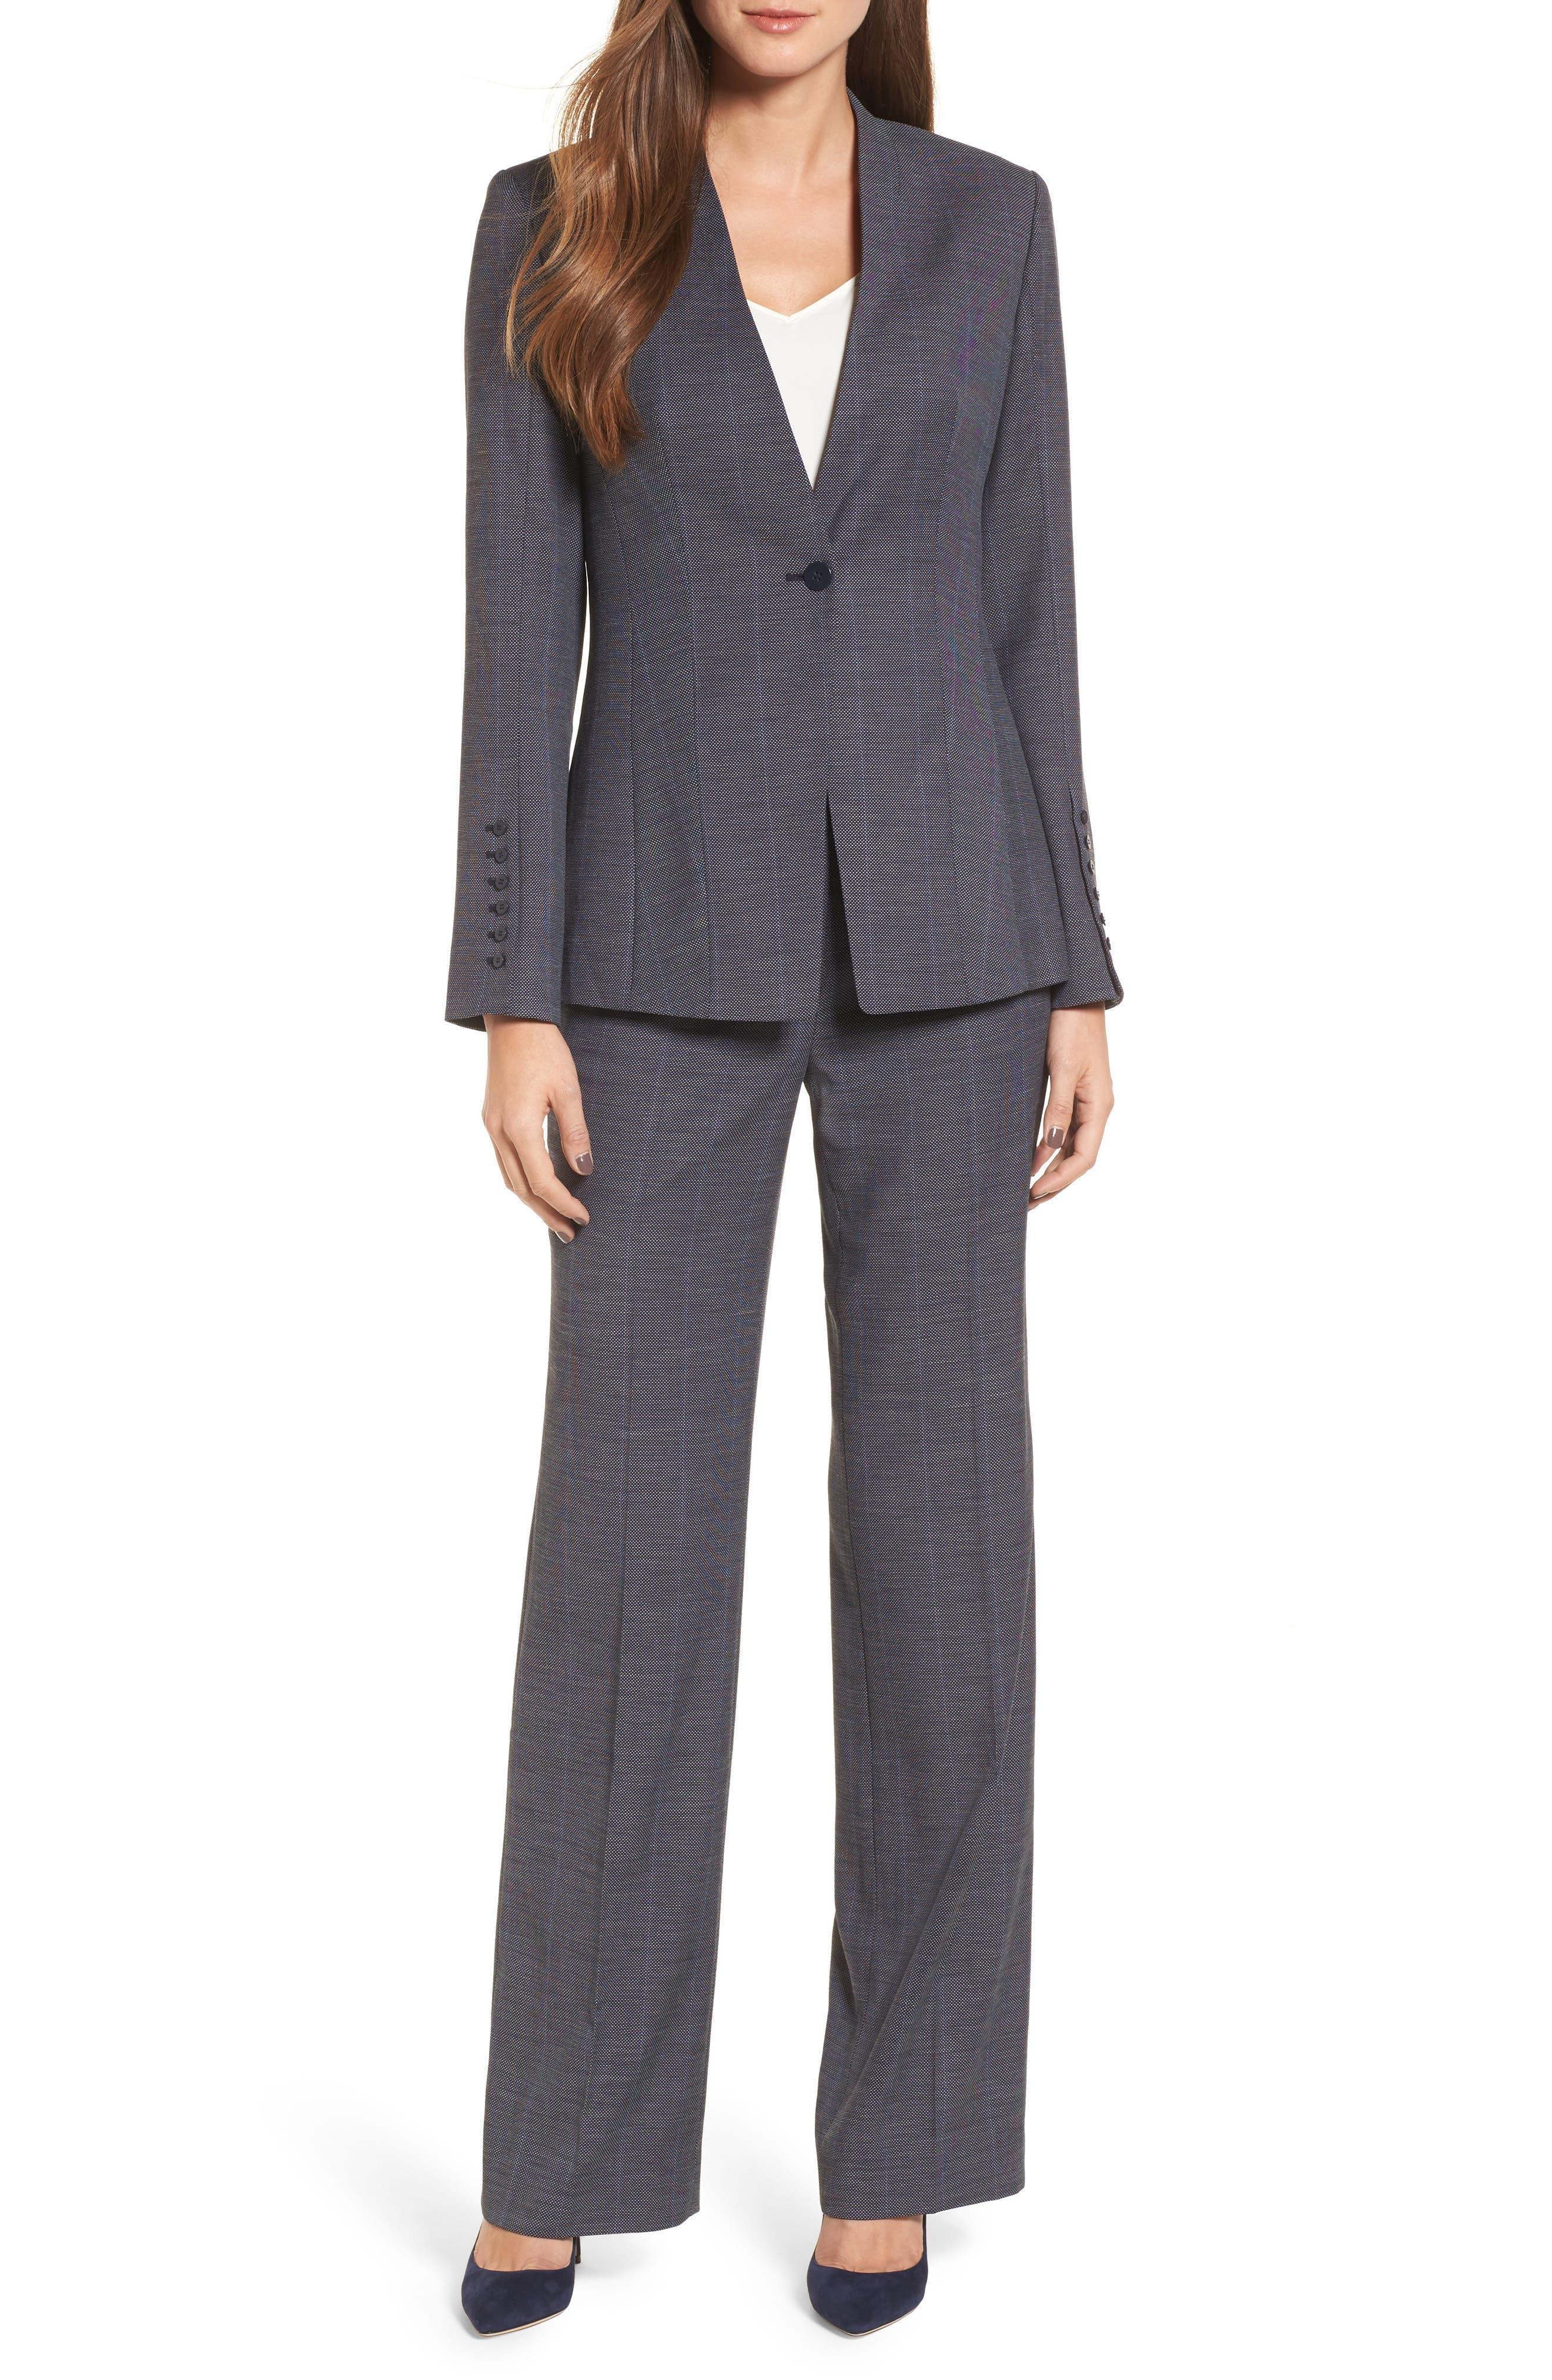 Cross Dye Suit Pants,                             Alternate thumbnail 6, color,                             Navy Crossdye Pattern